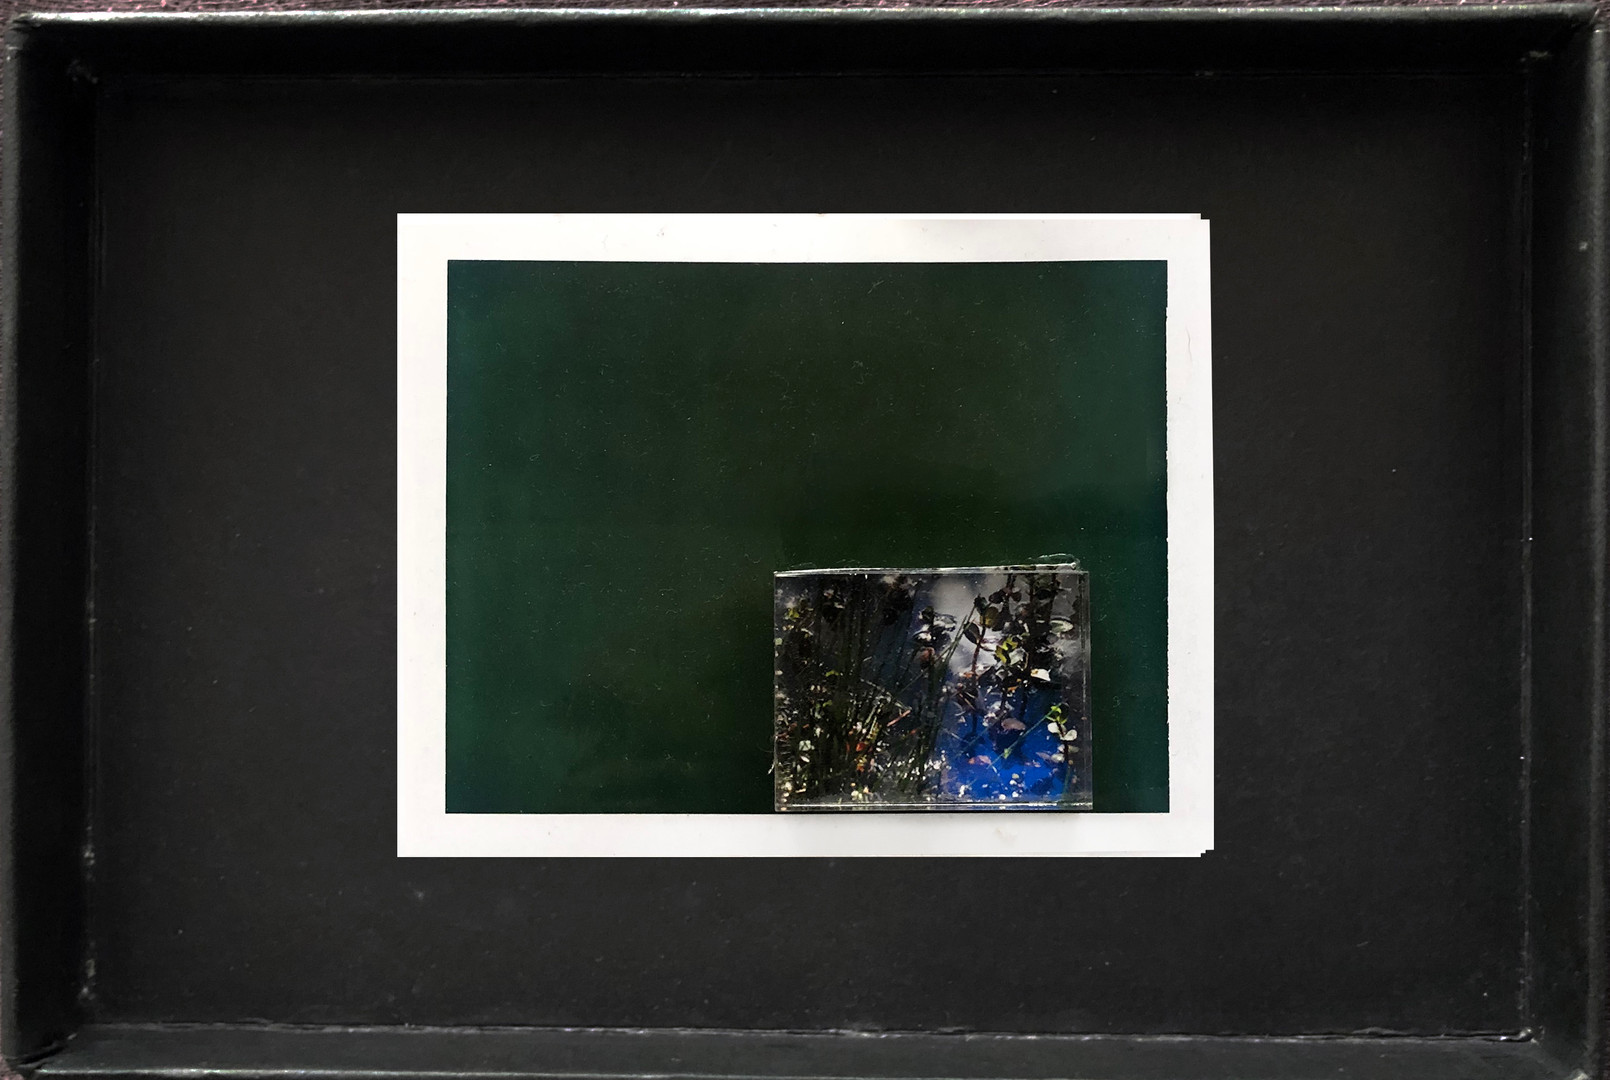 "Series X-Pola ""Nora's cat"" 2019 8/10cm mounted Plexiglass on Polaroid Edition 1/1 NIS 1,000 per object"